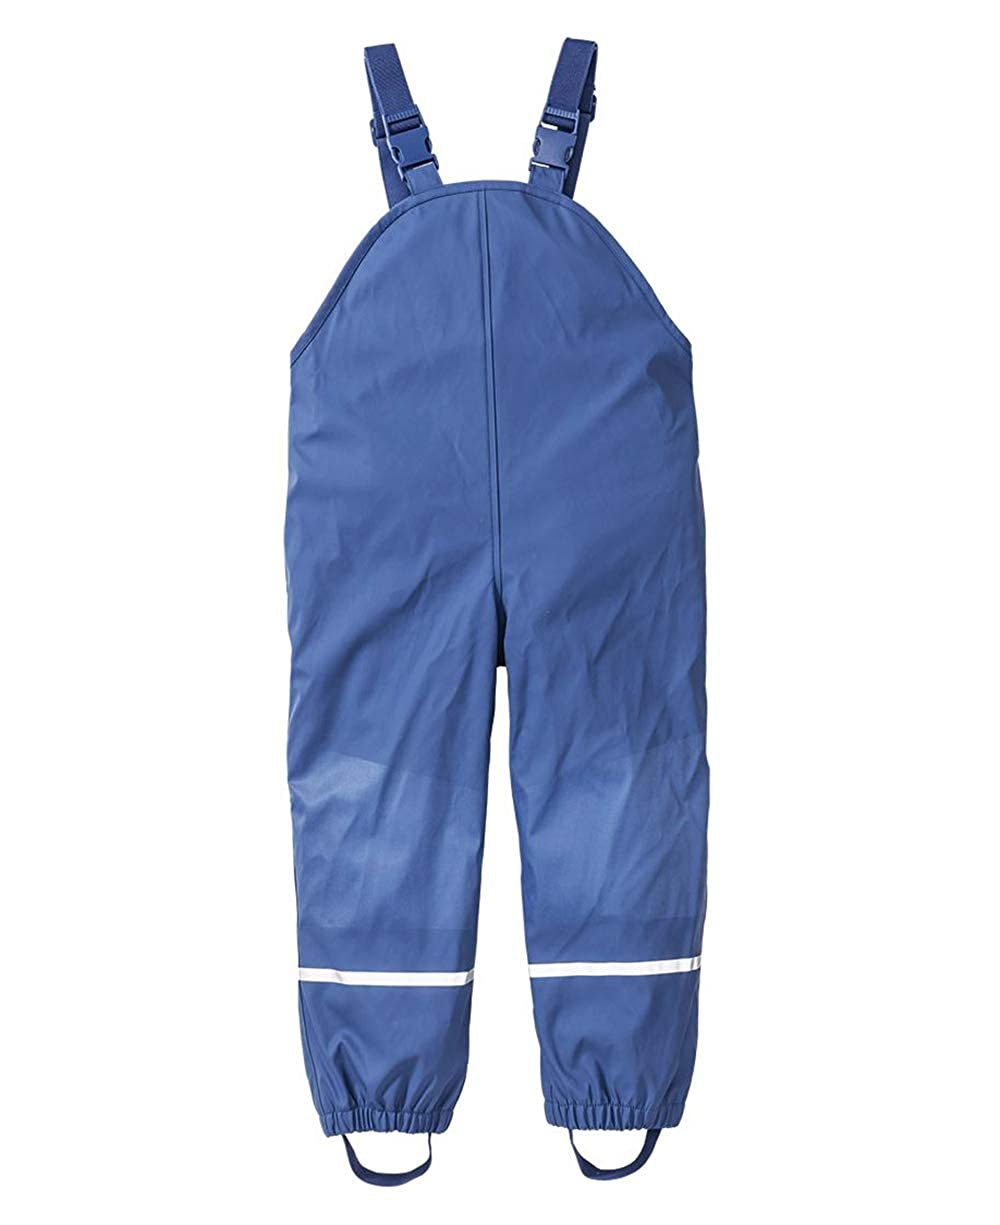 DAYU Unisex Kids' Fleece Lined Rain Pants Bibs Waterproof Overalls Age 2-7 Years DAYU INC.